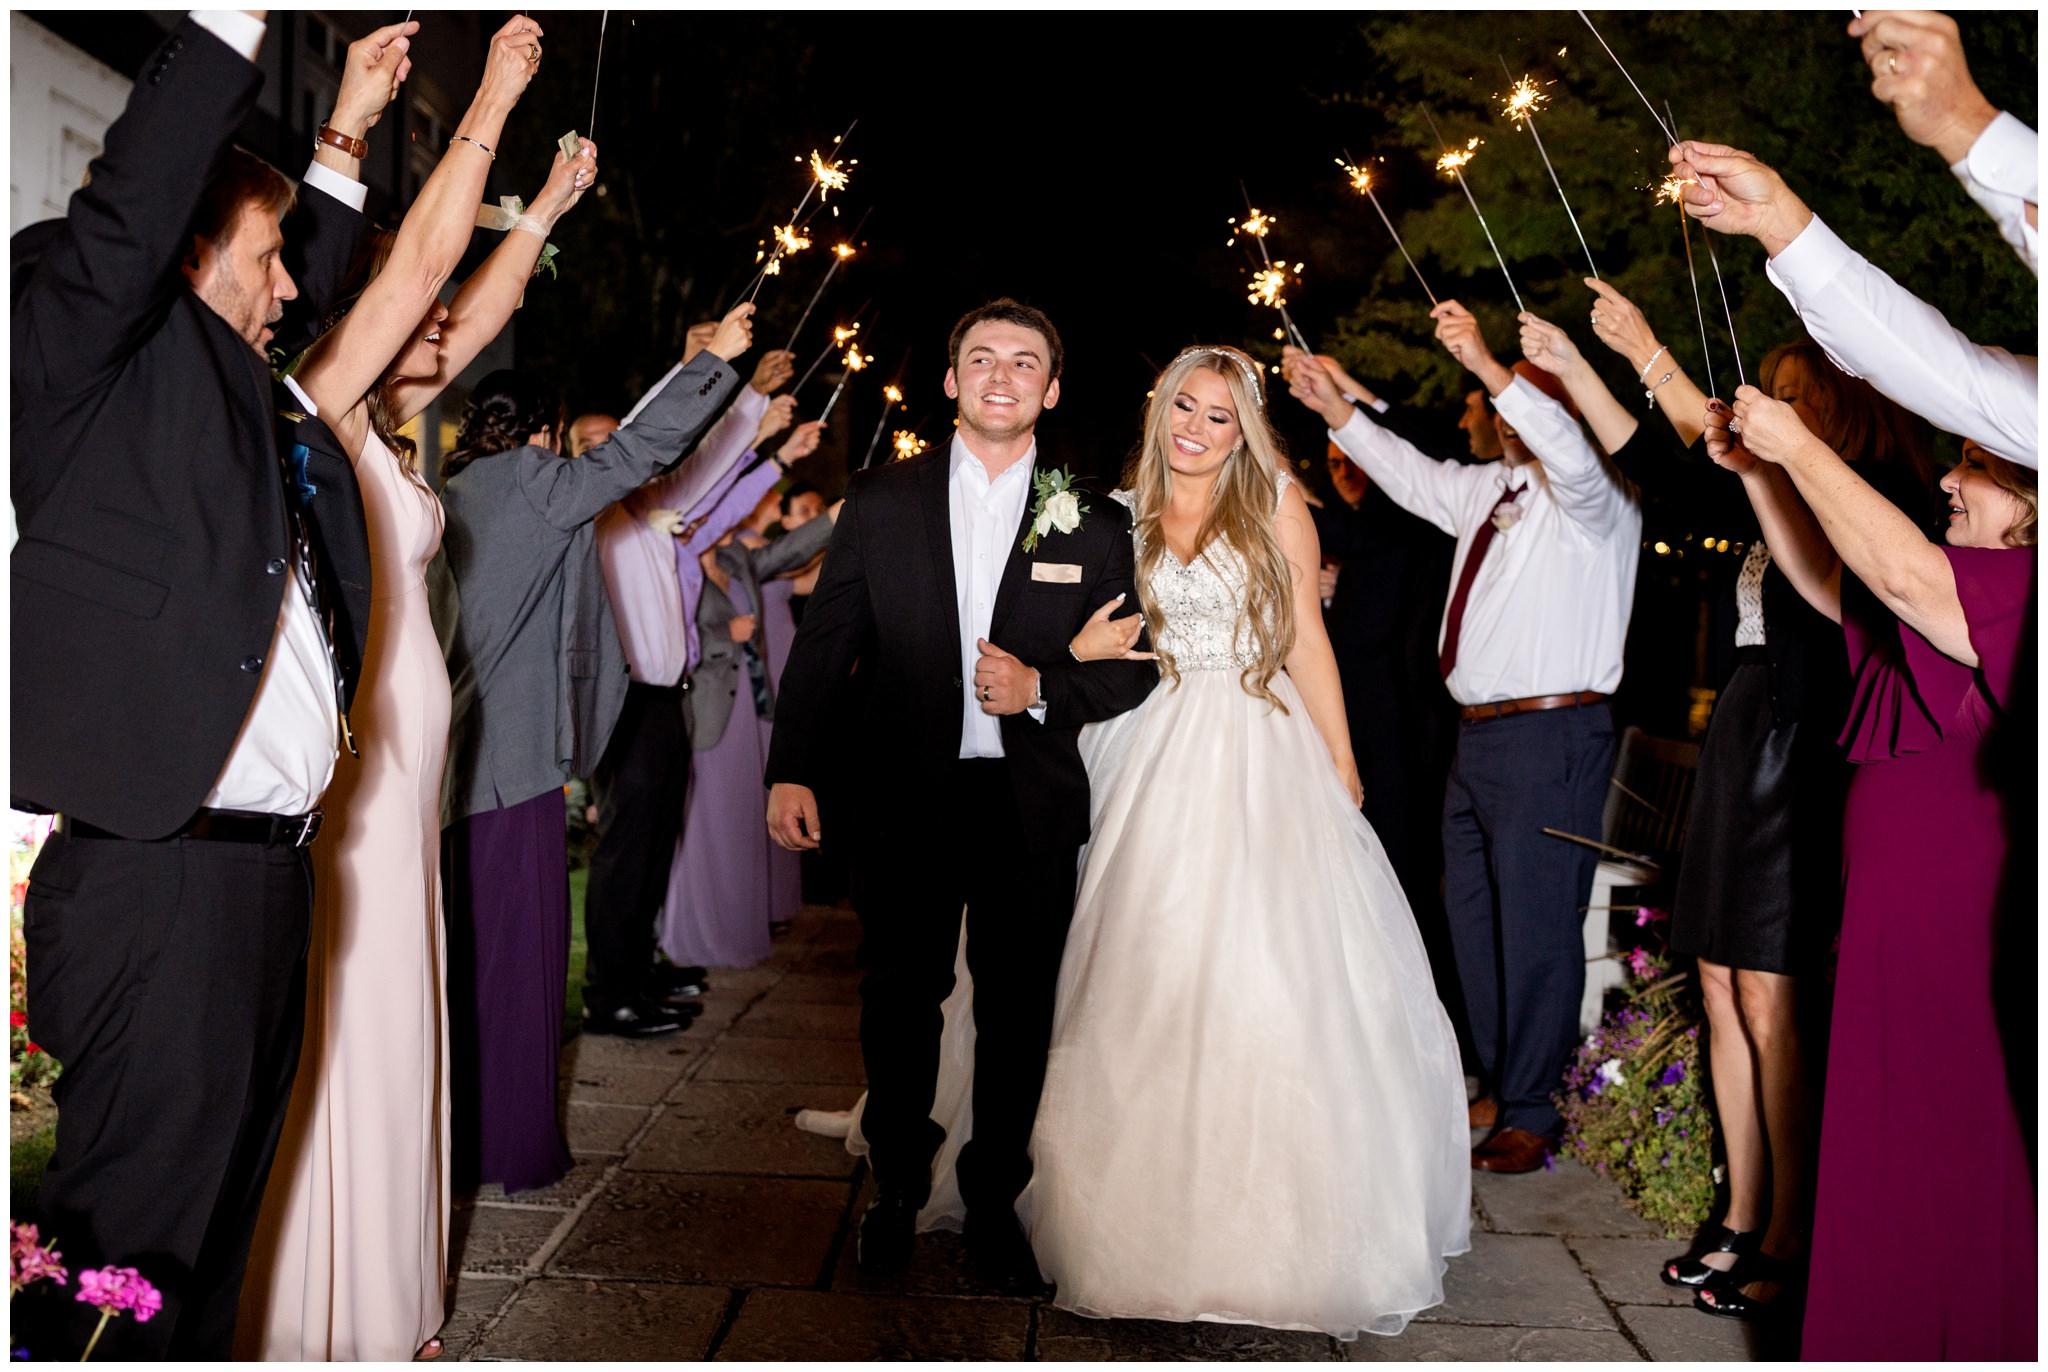 Sparkler Exit at wedding venue in Utah